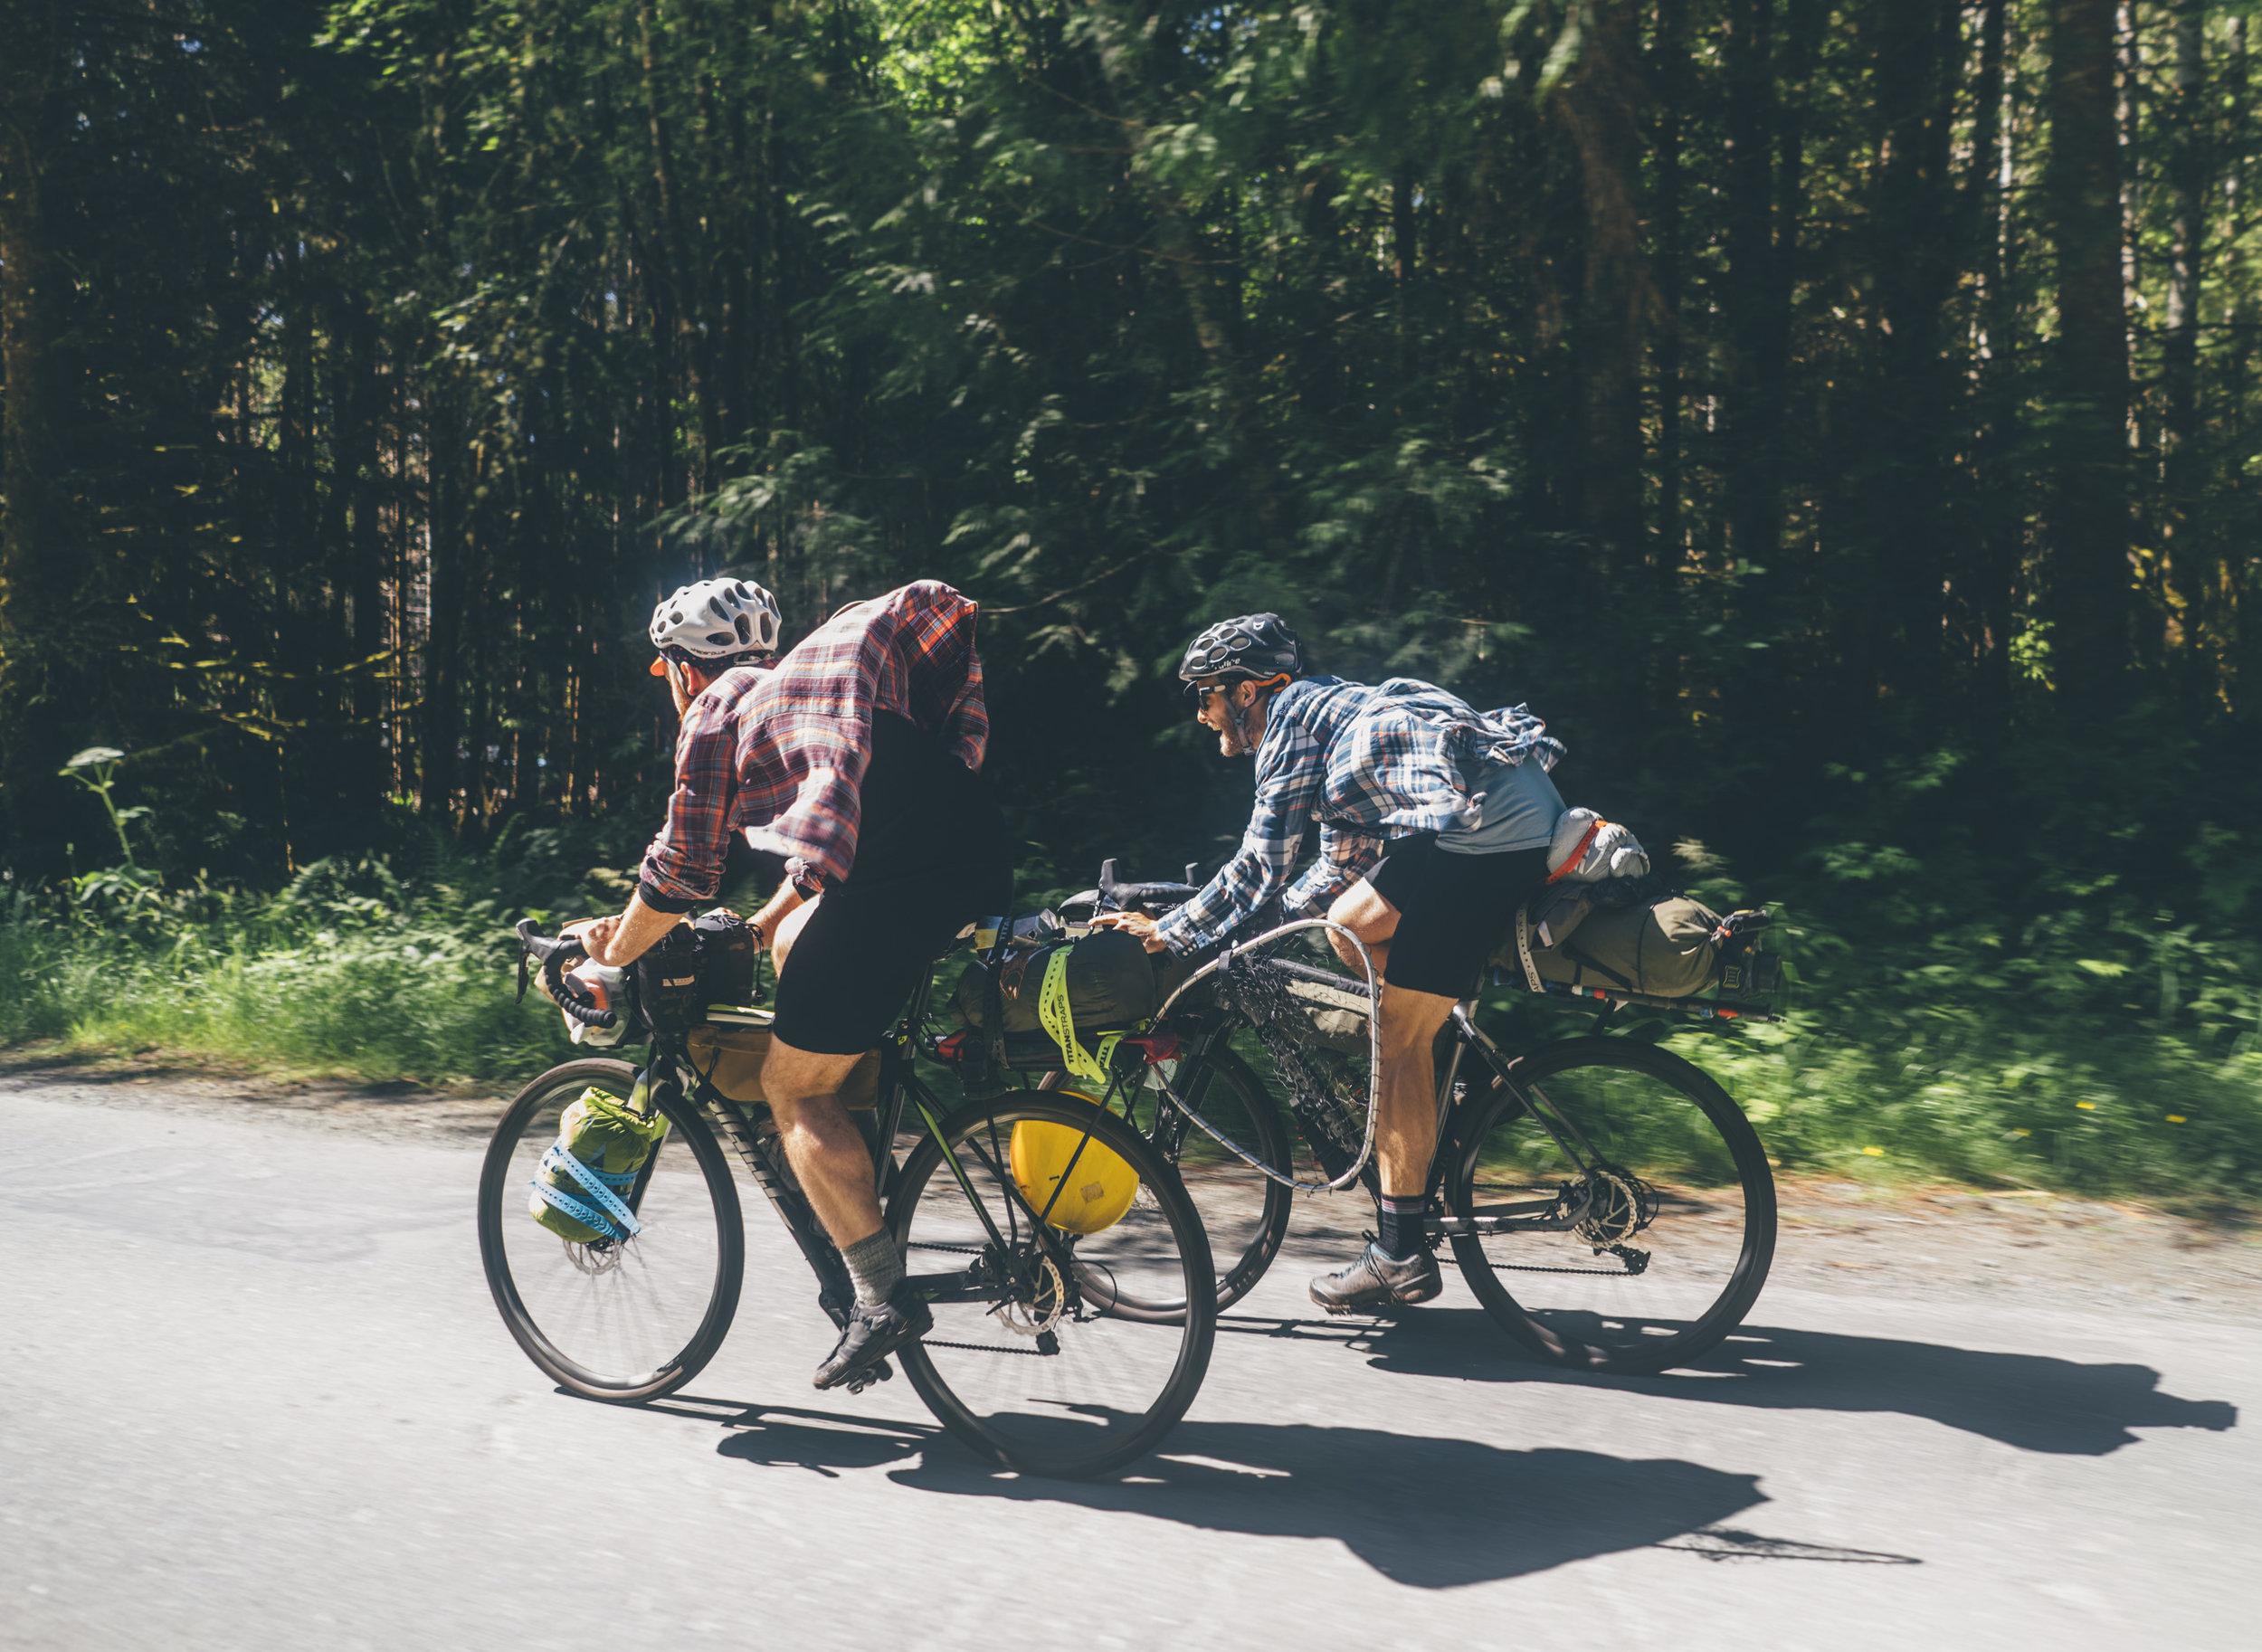 Bikepacking-VanIsland-JohnsonStudios-201806-234.jpg